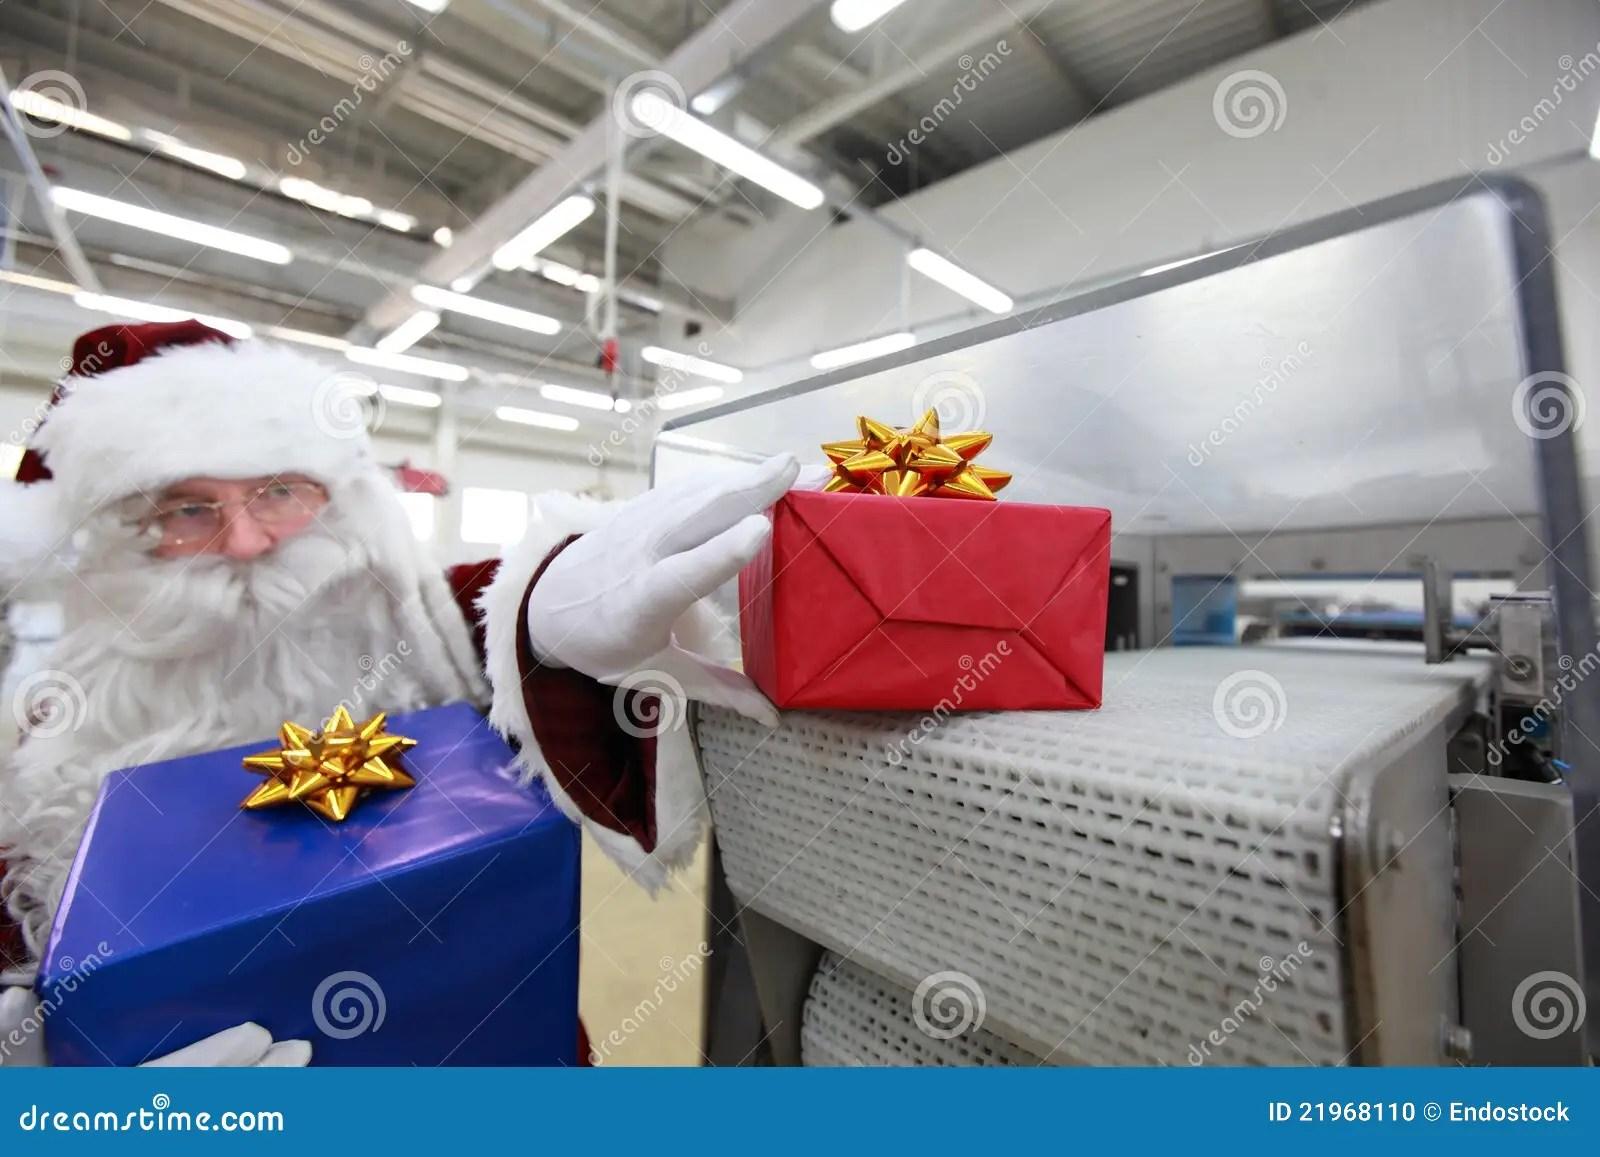 Santa Claus Amp Christmas Gift Machine Stock Photo Image